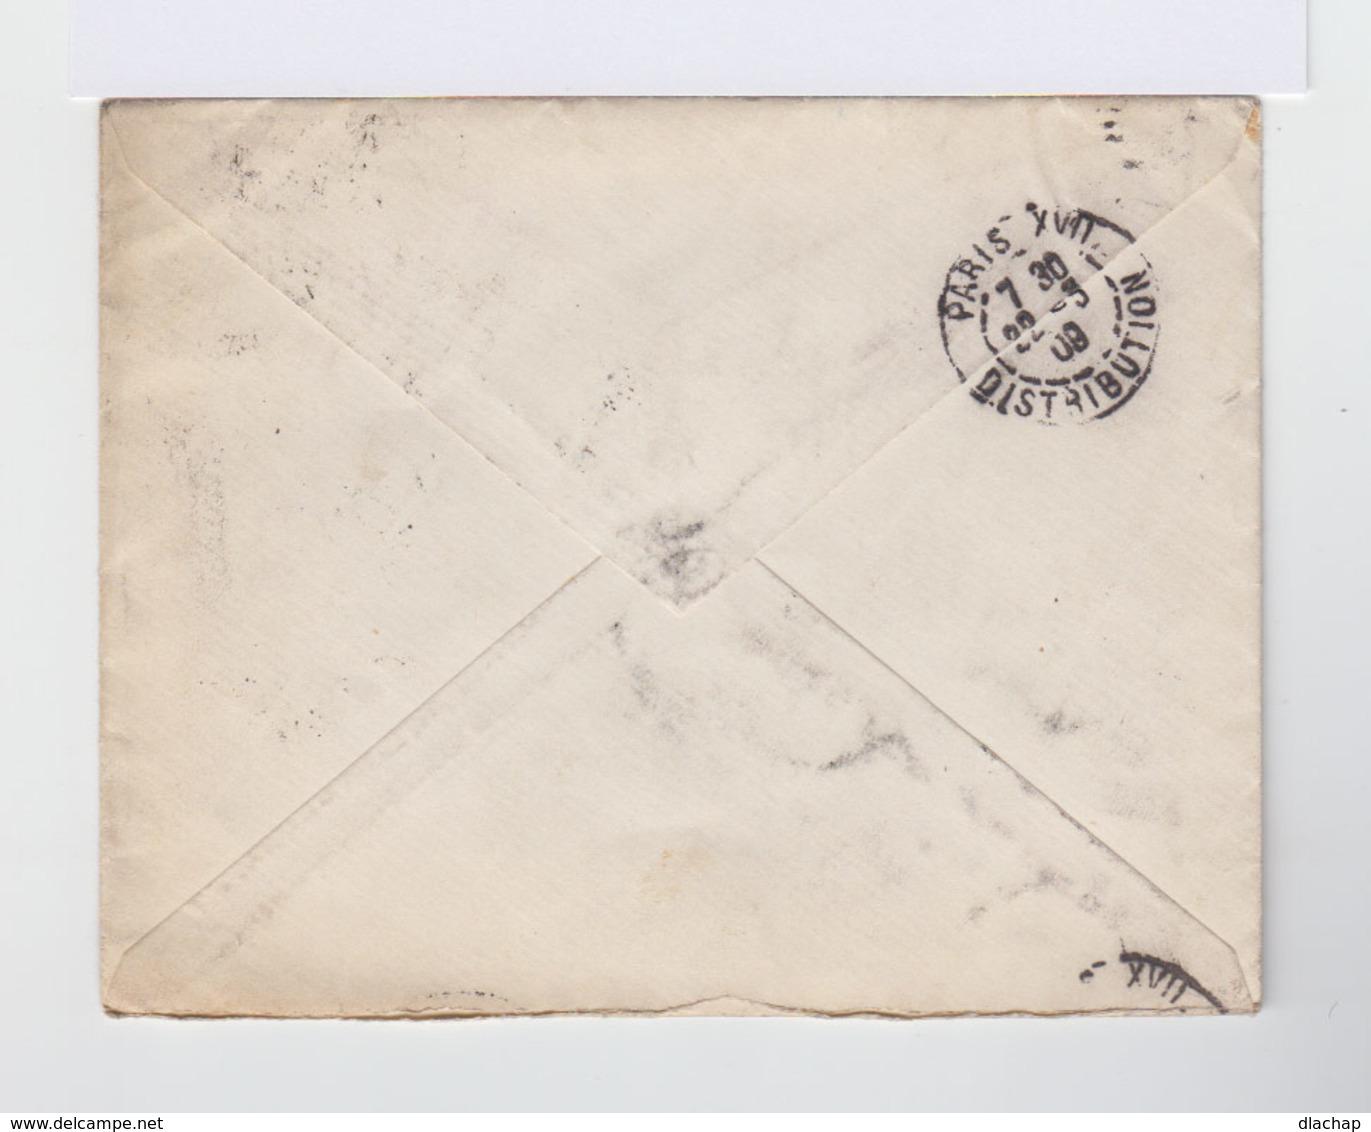 Enveloppe Moscou Vers Paris. Timbres Empire Russe Armoiries Paire De 5 K Lilas CAD Mockba 1909. (804) - 1857-1916 Empire